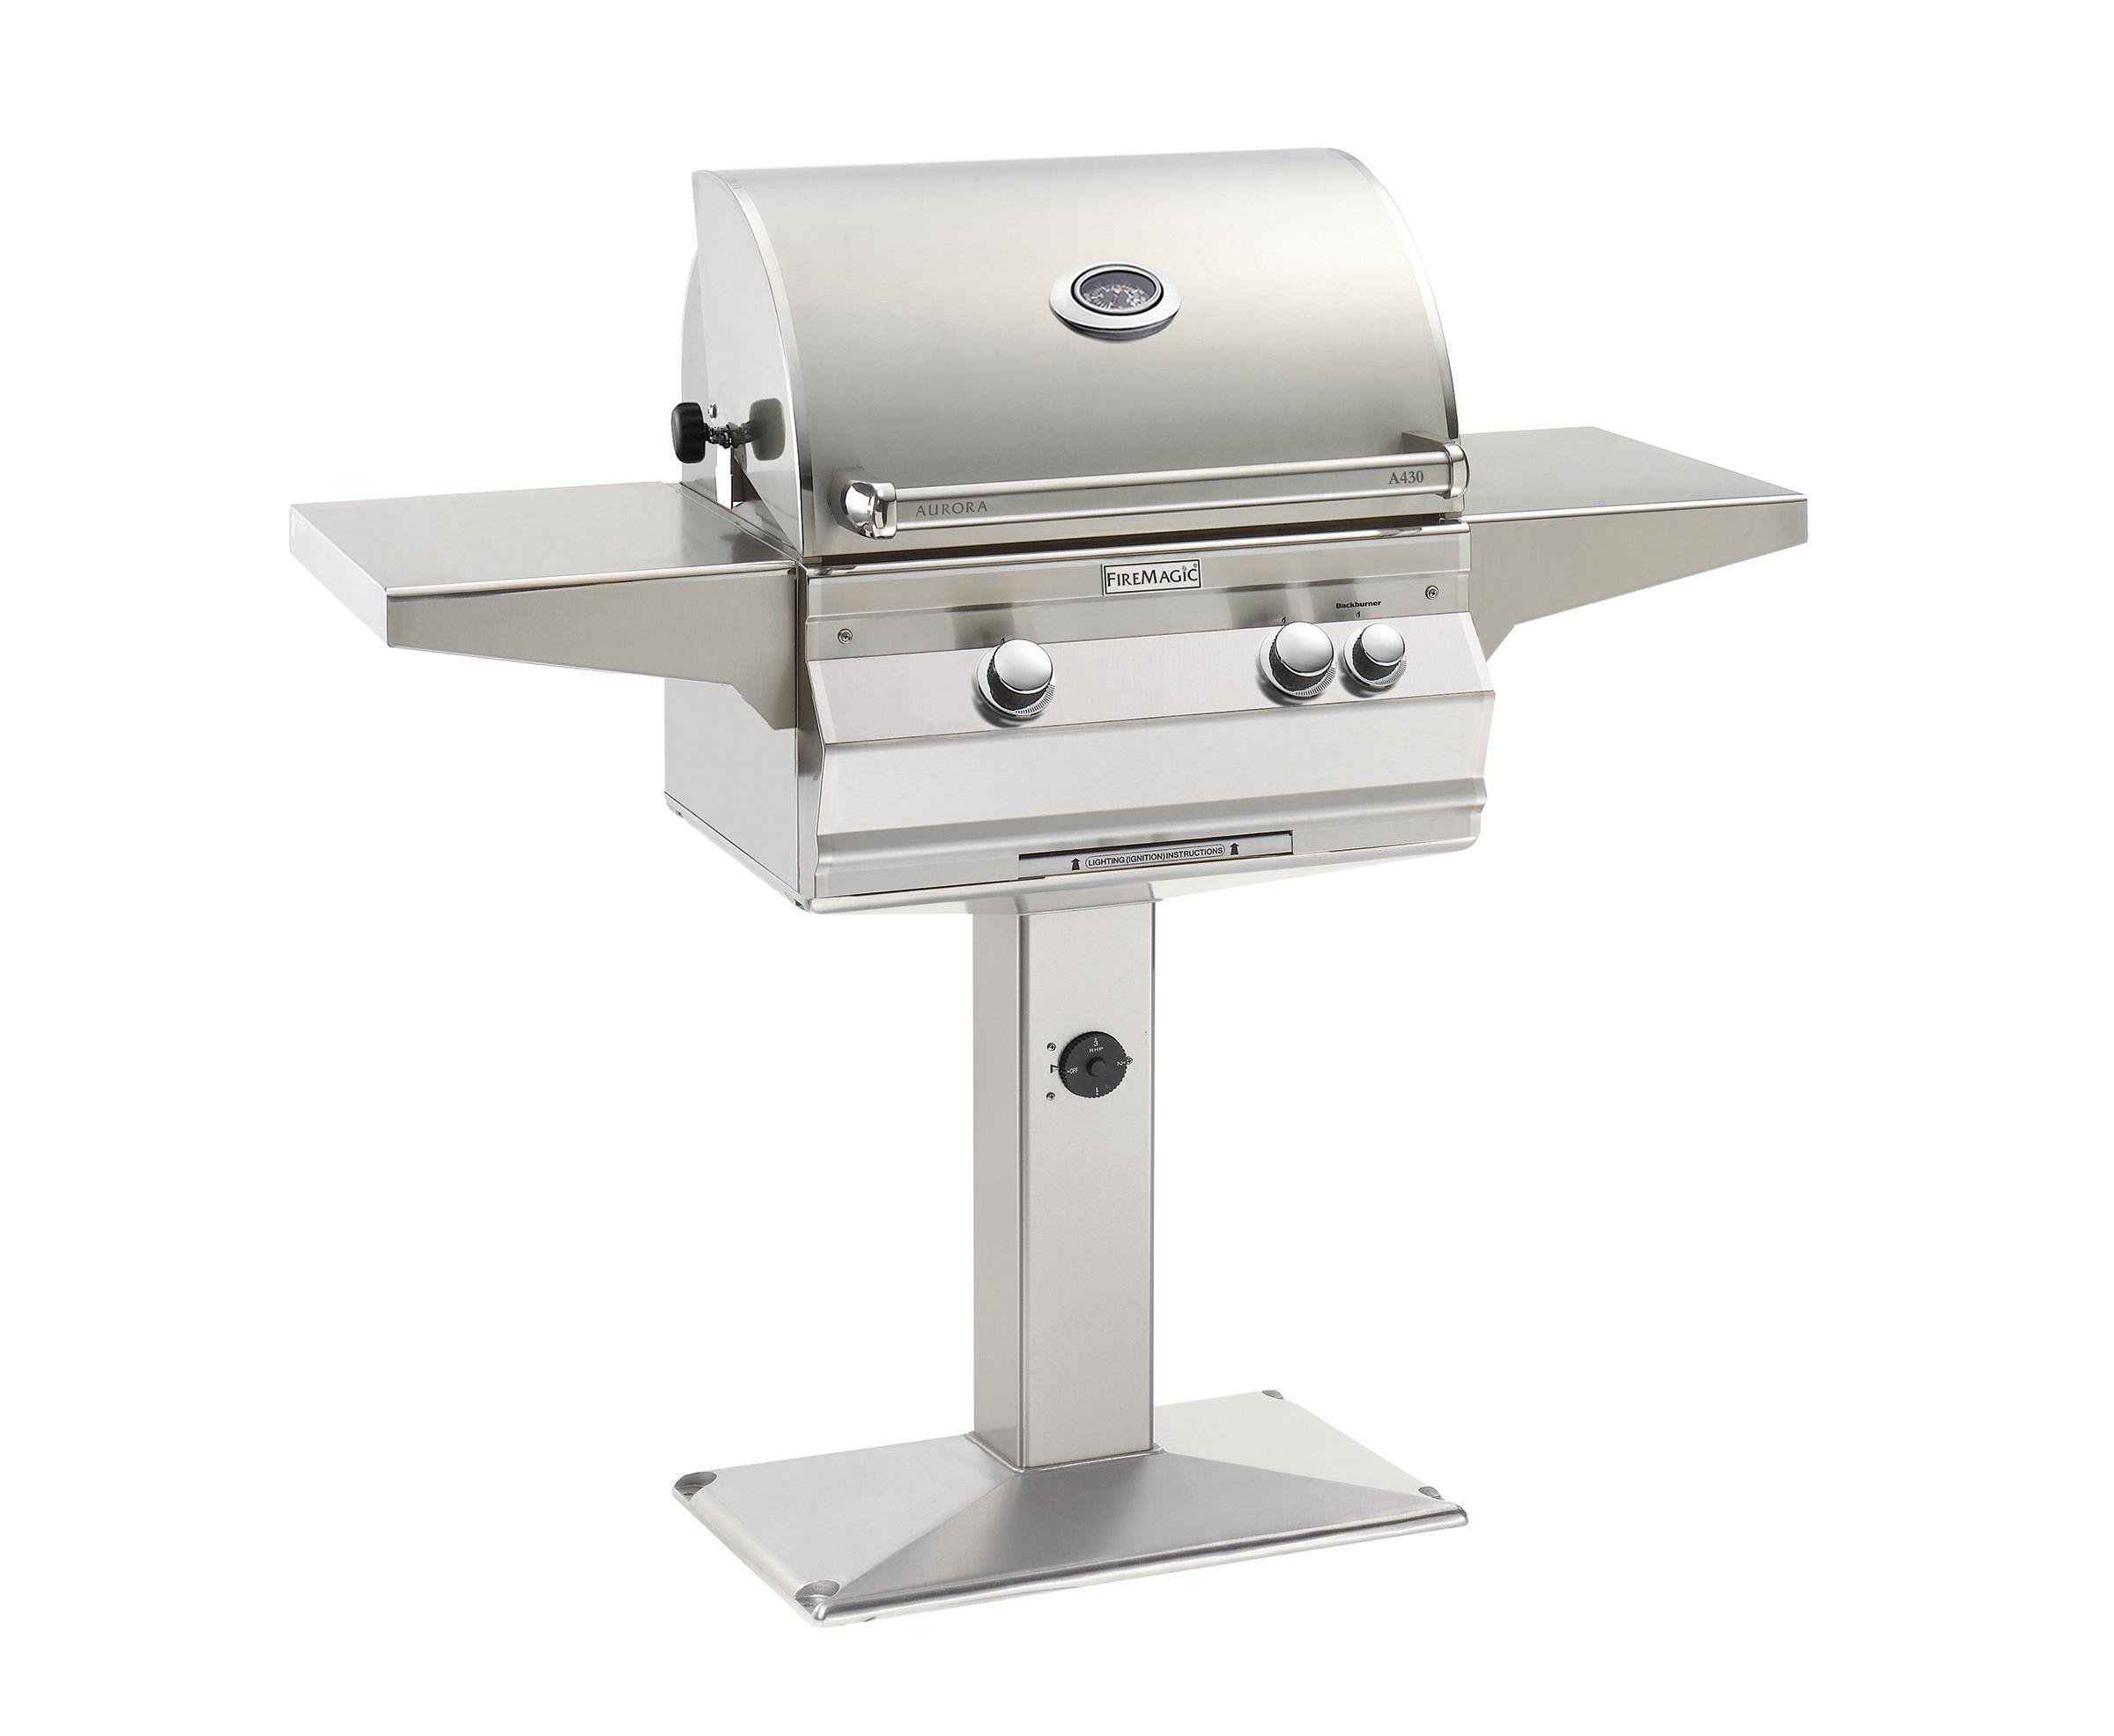 fm-a430s-p6-aurora-analog-pedestal-grill.jpg